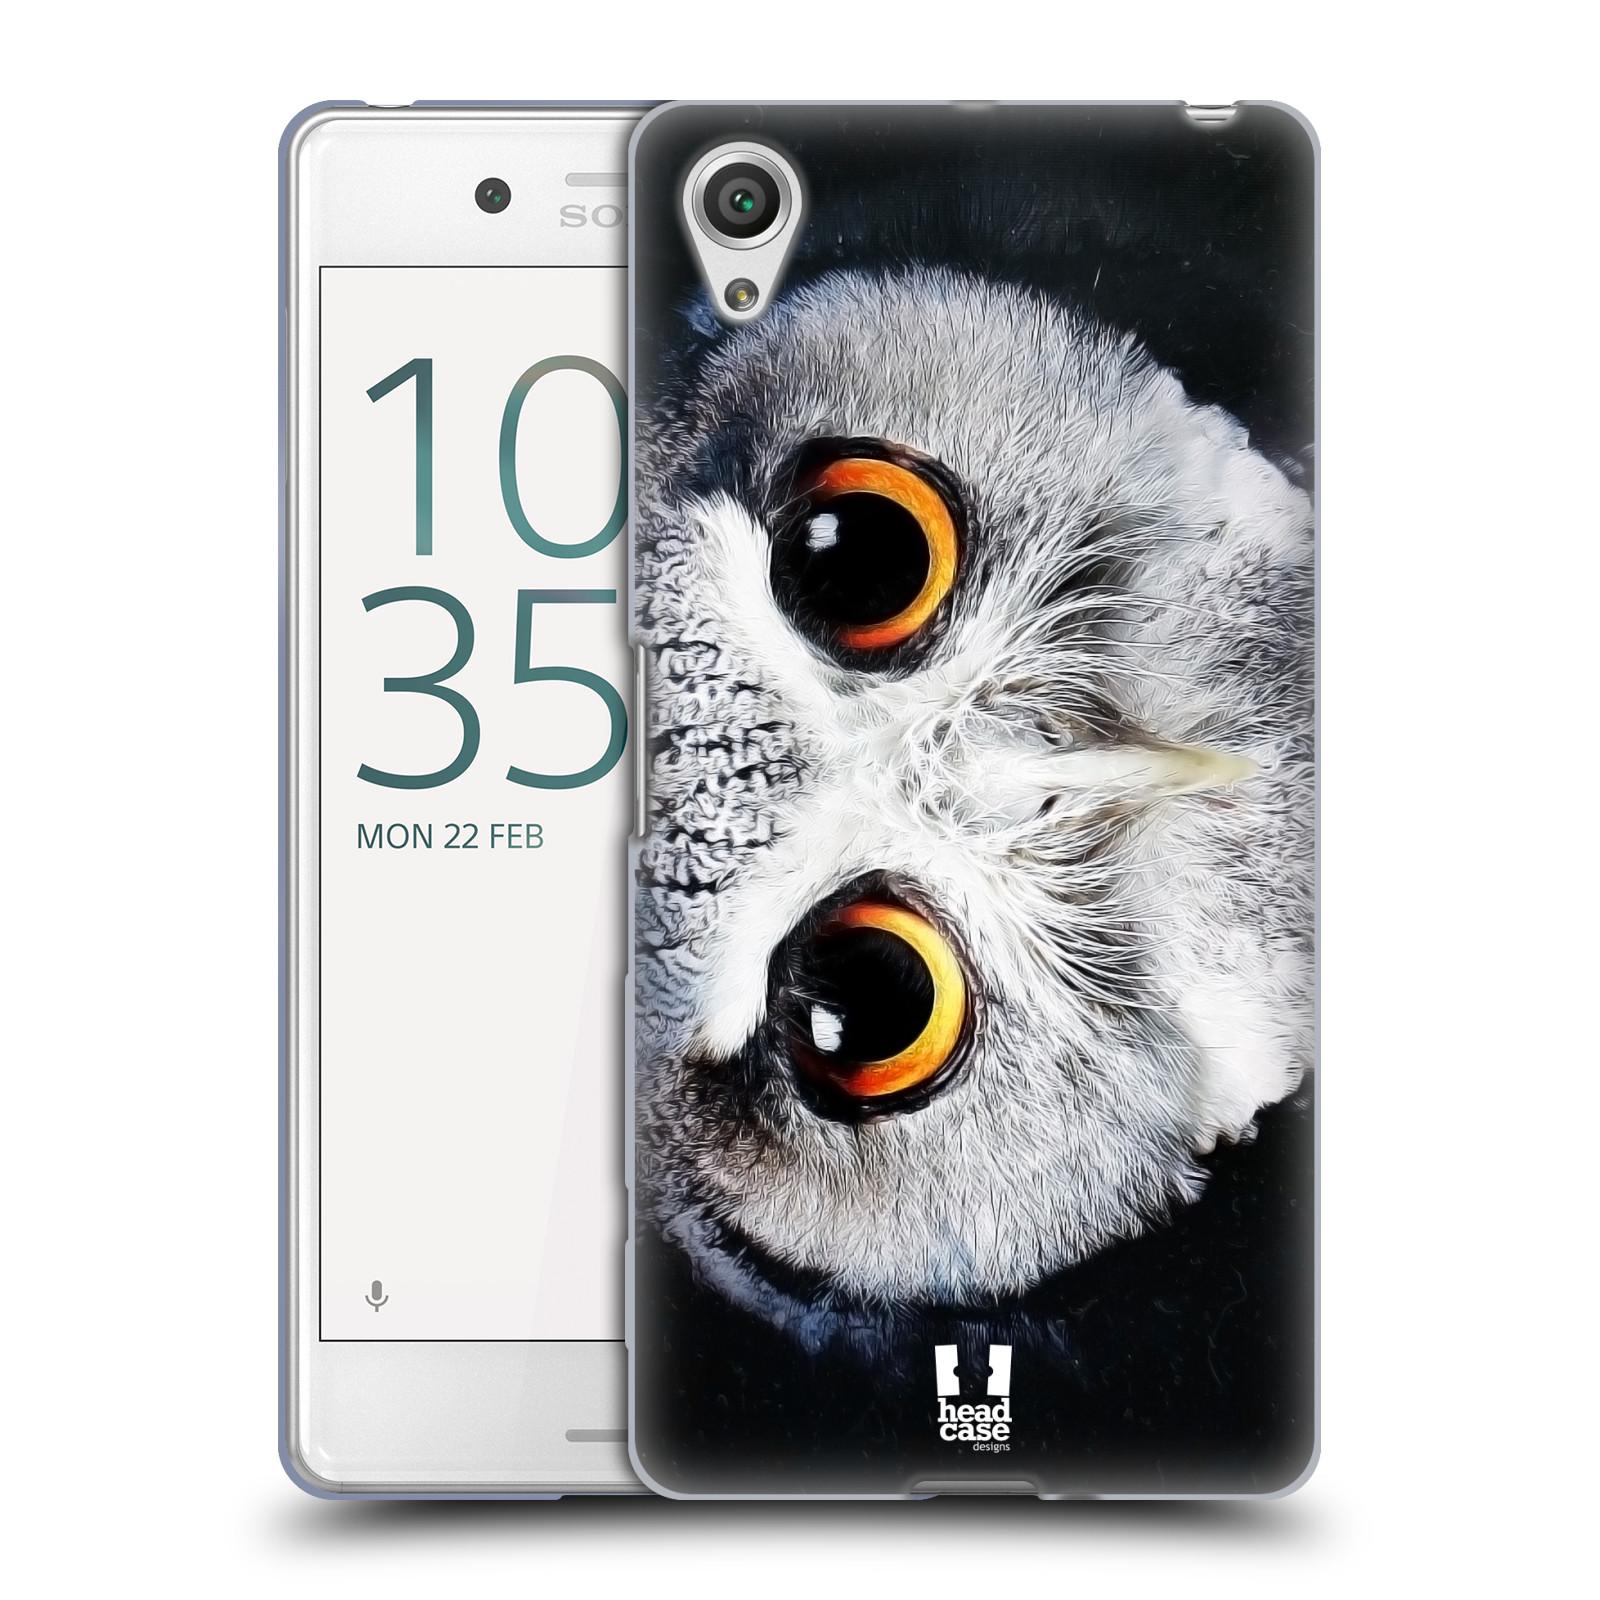 HEAD CASE silikonový obal na mobil Sony Xperia X PERFORMANCE (F8131, F8132) vzor Zvířecí tváře sova